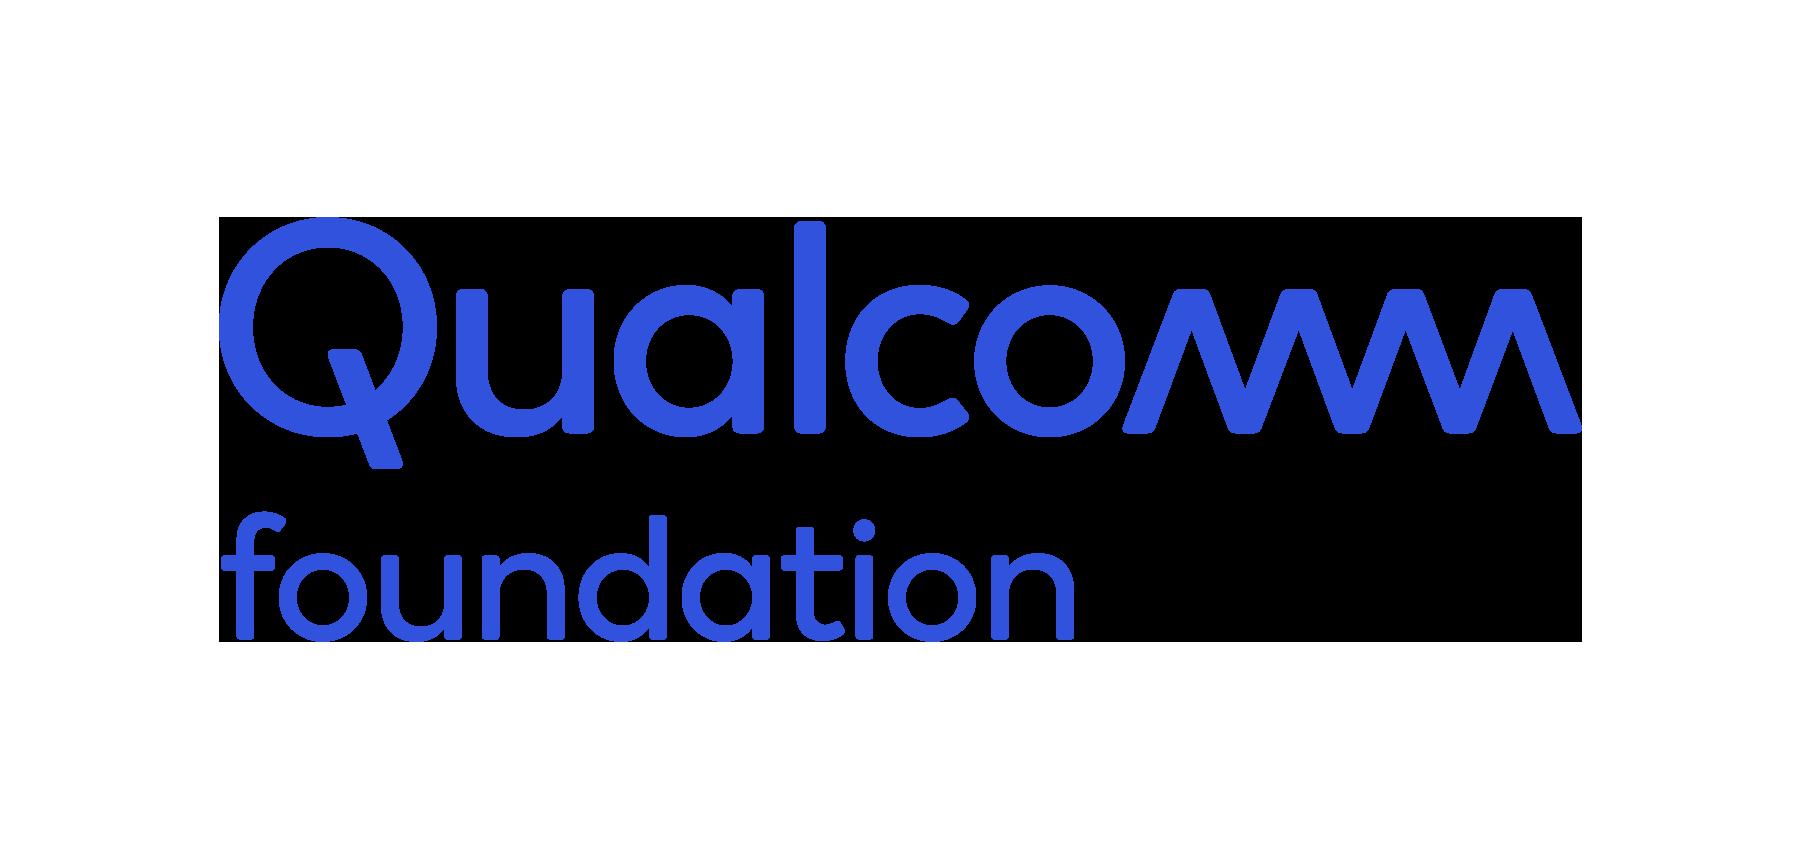 qc_foundation_RGB.PNG